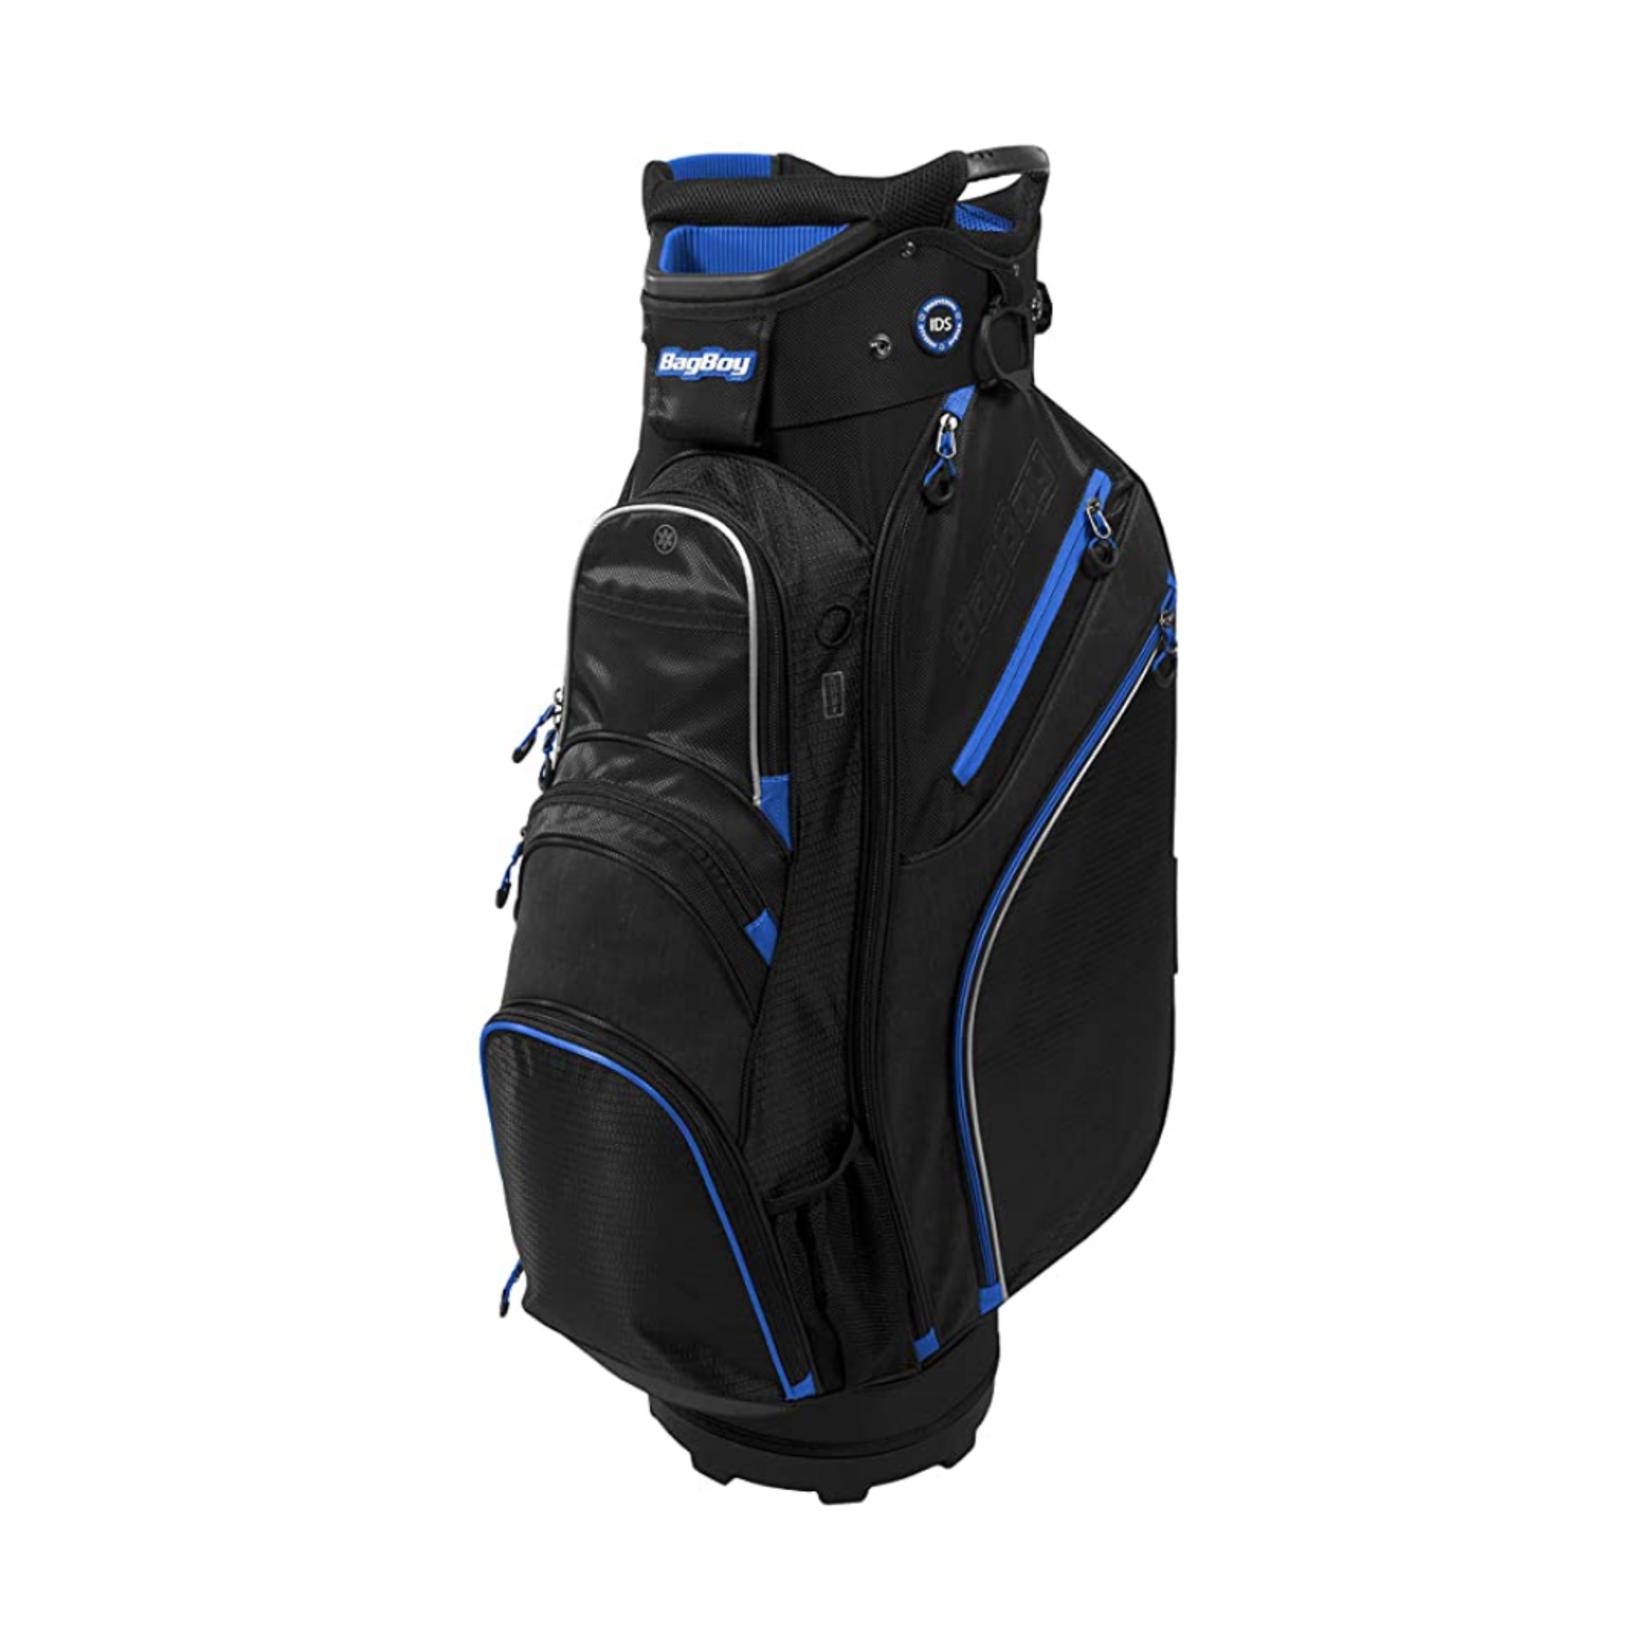 Bag Boy Bag Boy Chiller Cart Bag